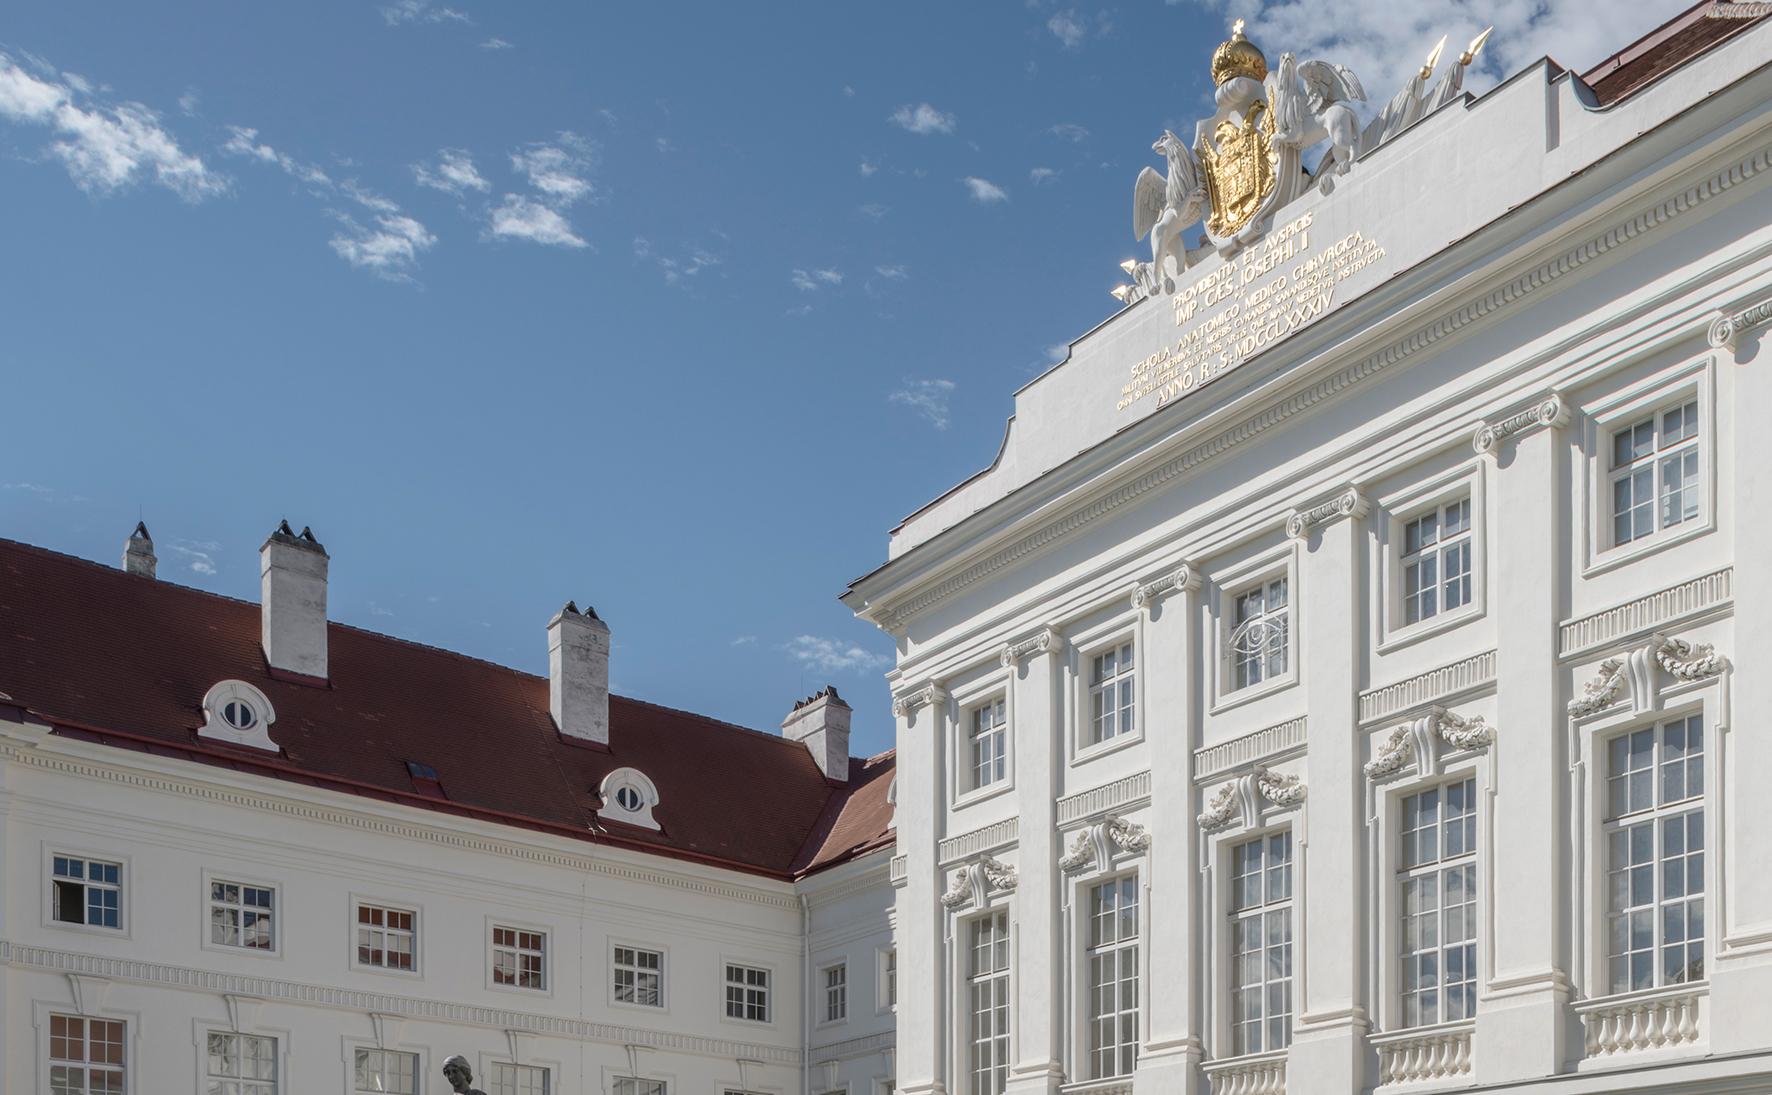 Hertha Hurnaus; Josephinum – Ethics, Collections and History of Medicine, MedUni Vienna